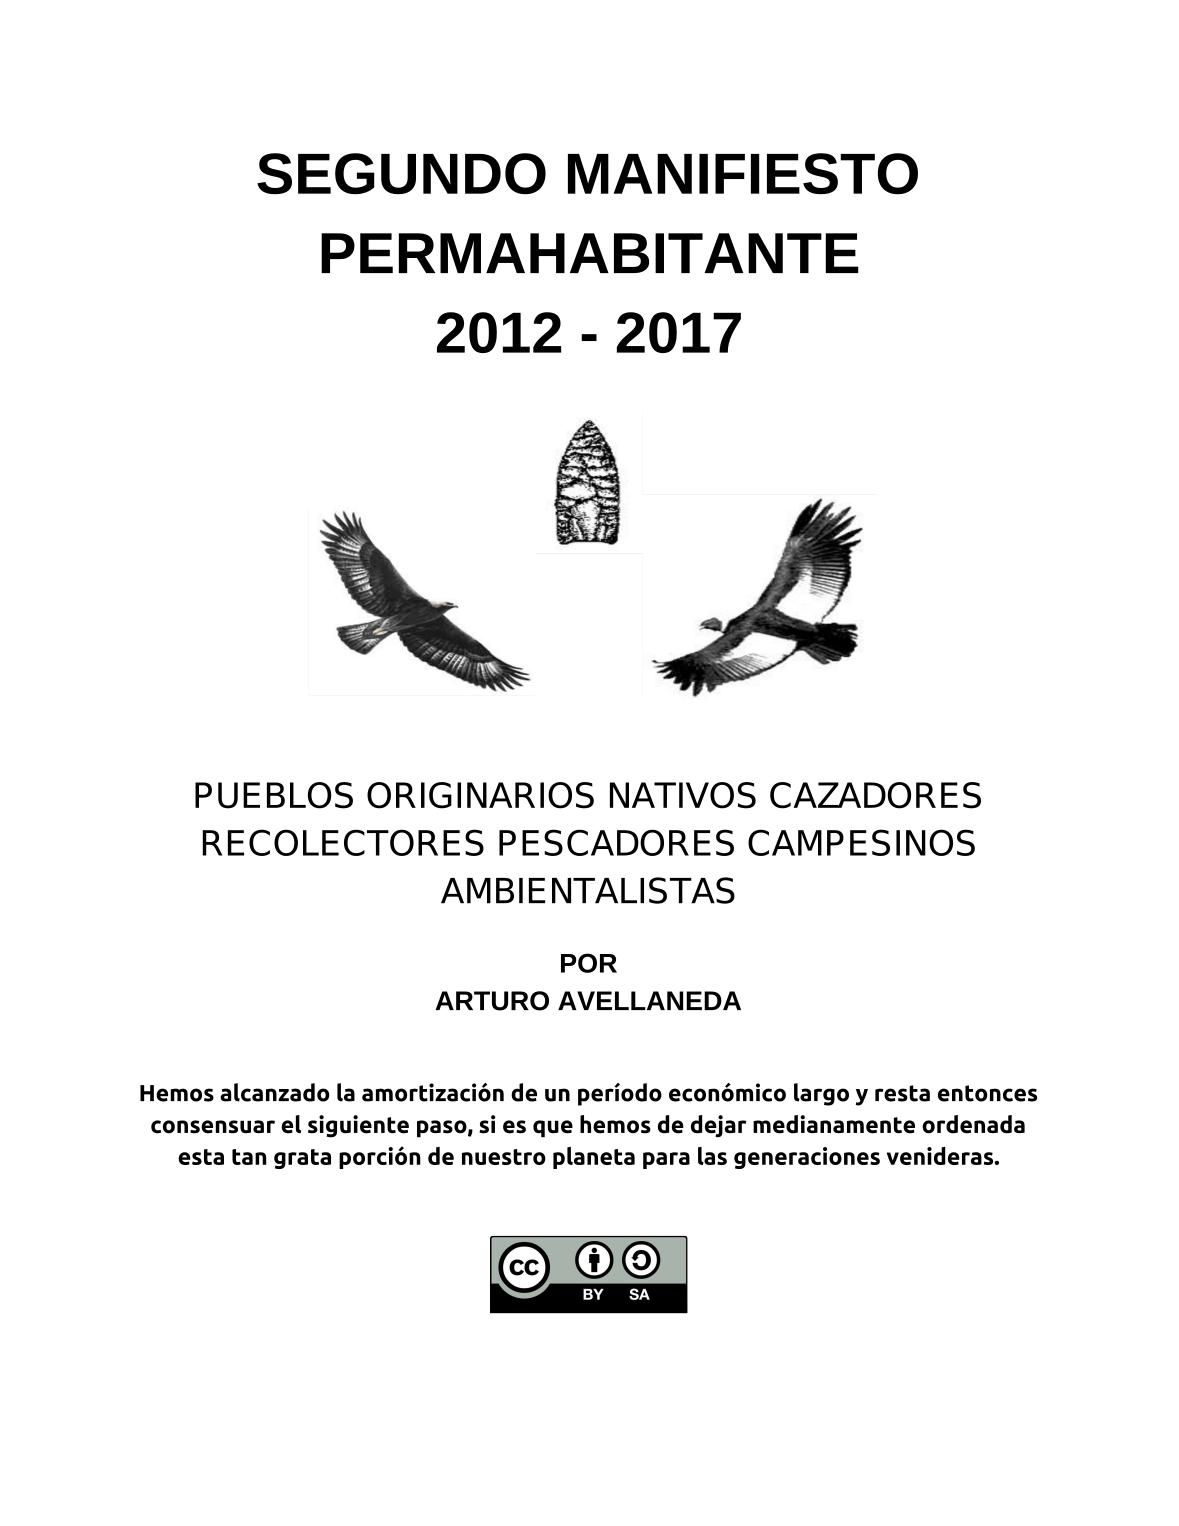 SEGUNDO MANIFIESTO PERMAHABITANTE